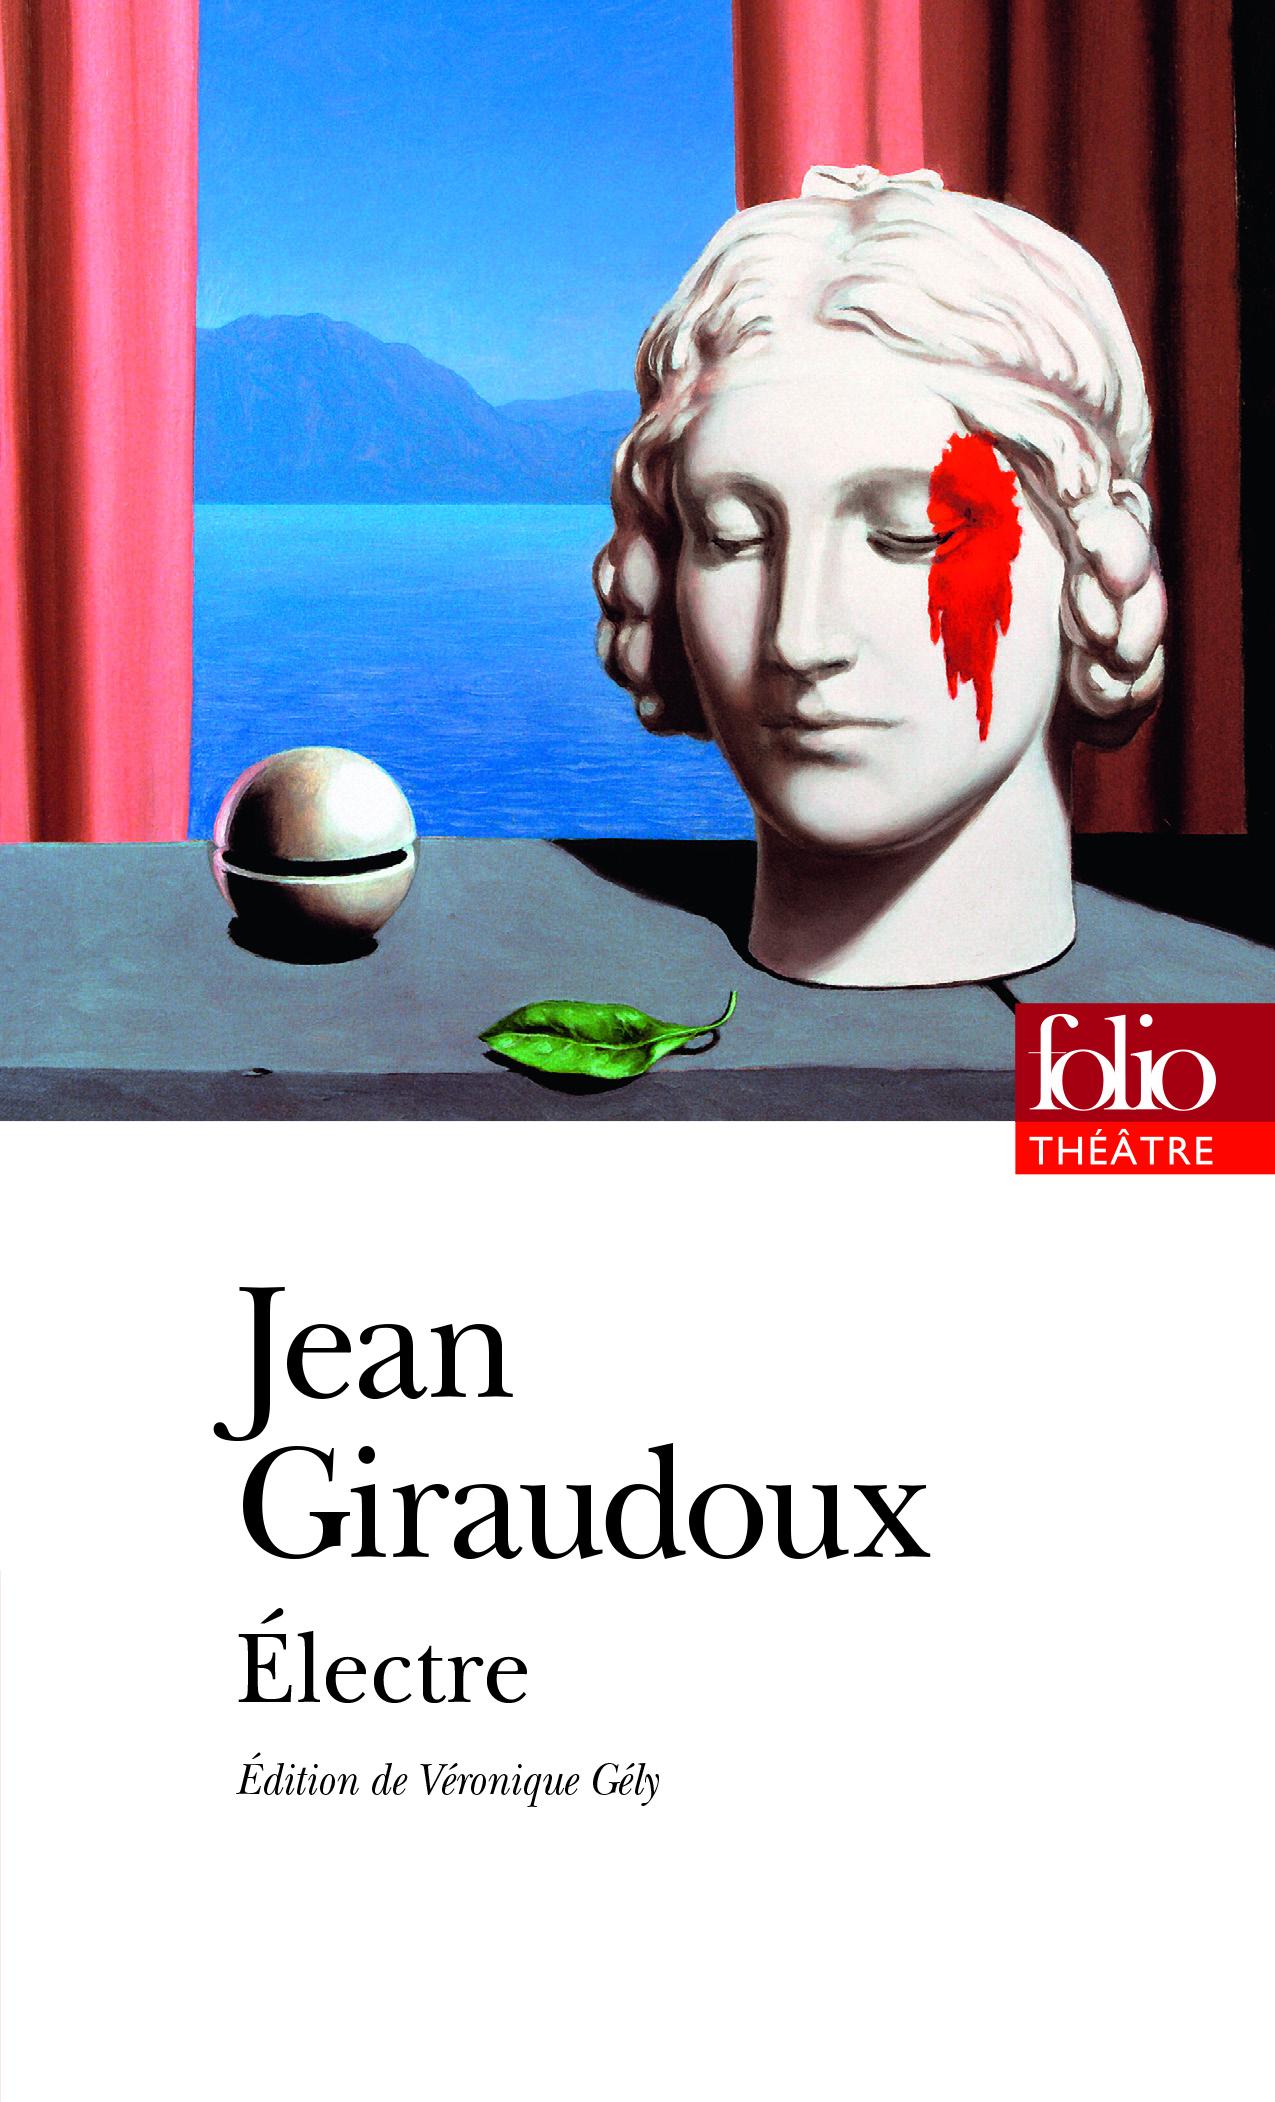 J. Giraudoux,Électre